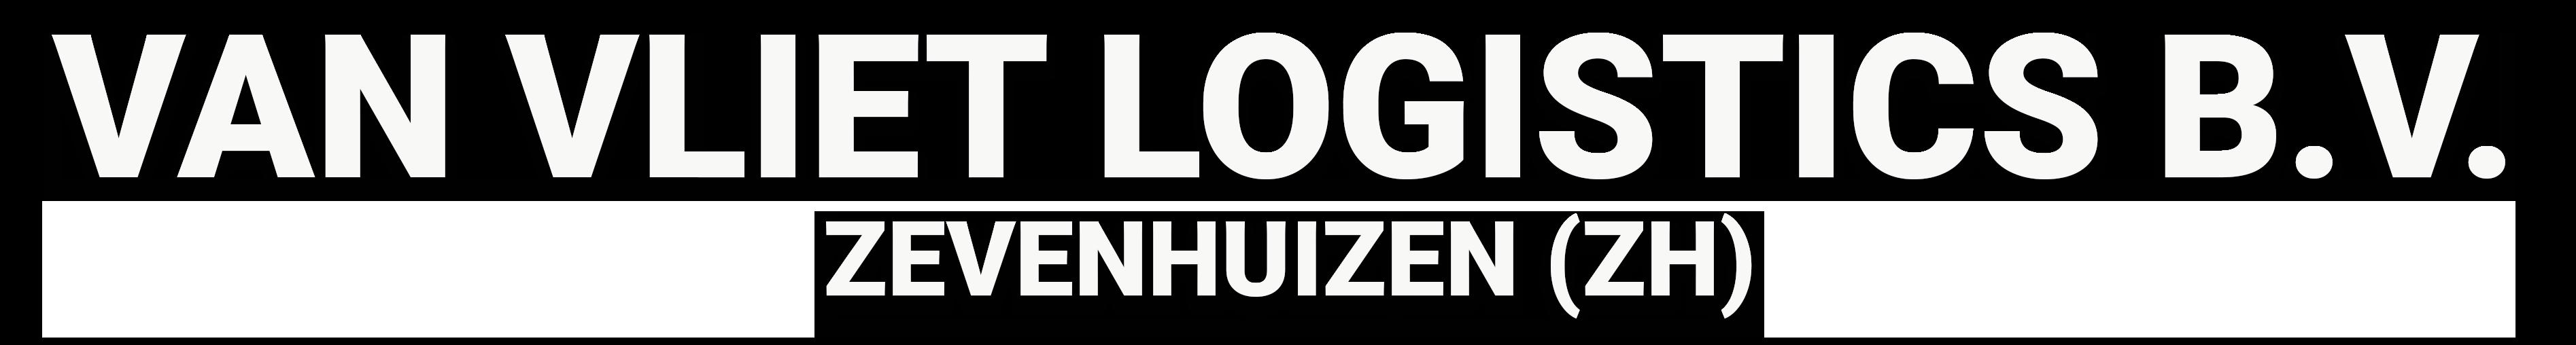 Van Vliet Logistics B.V.